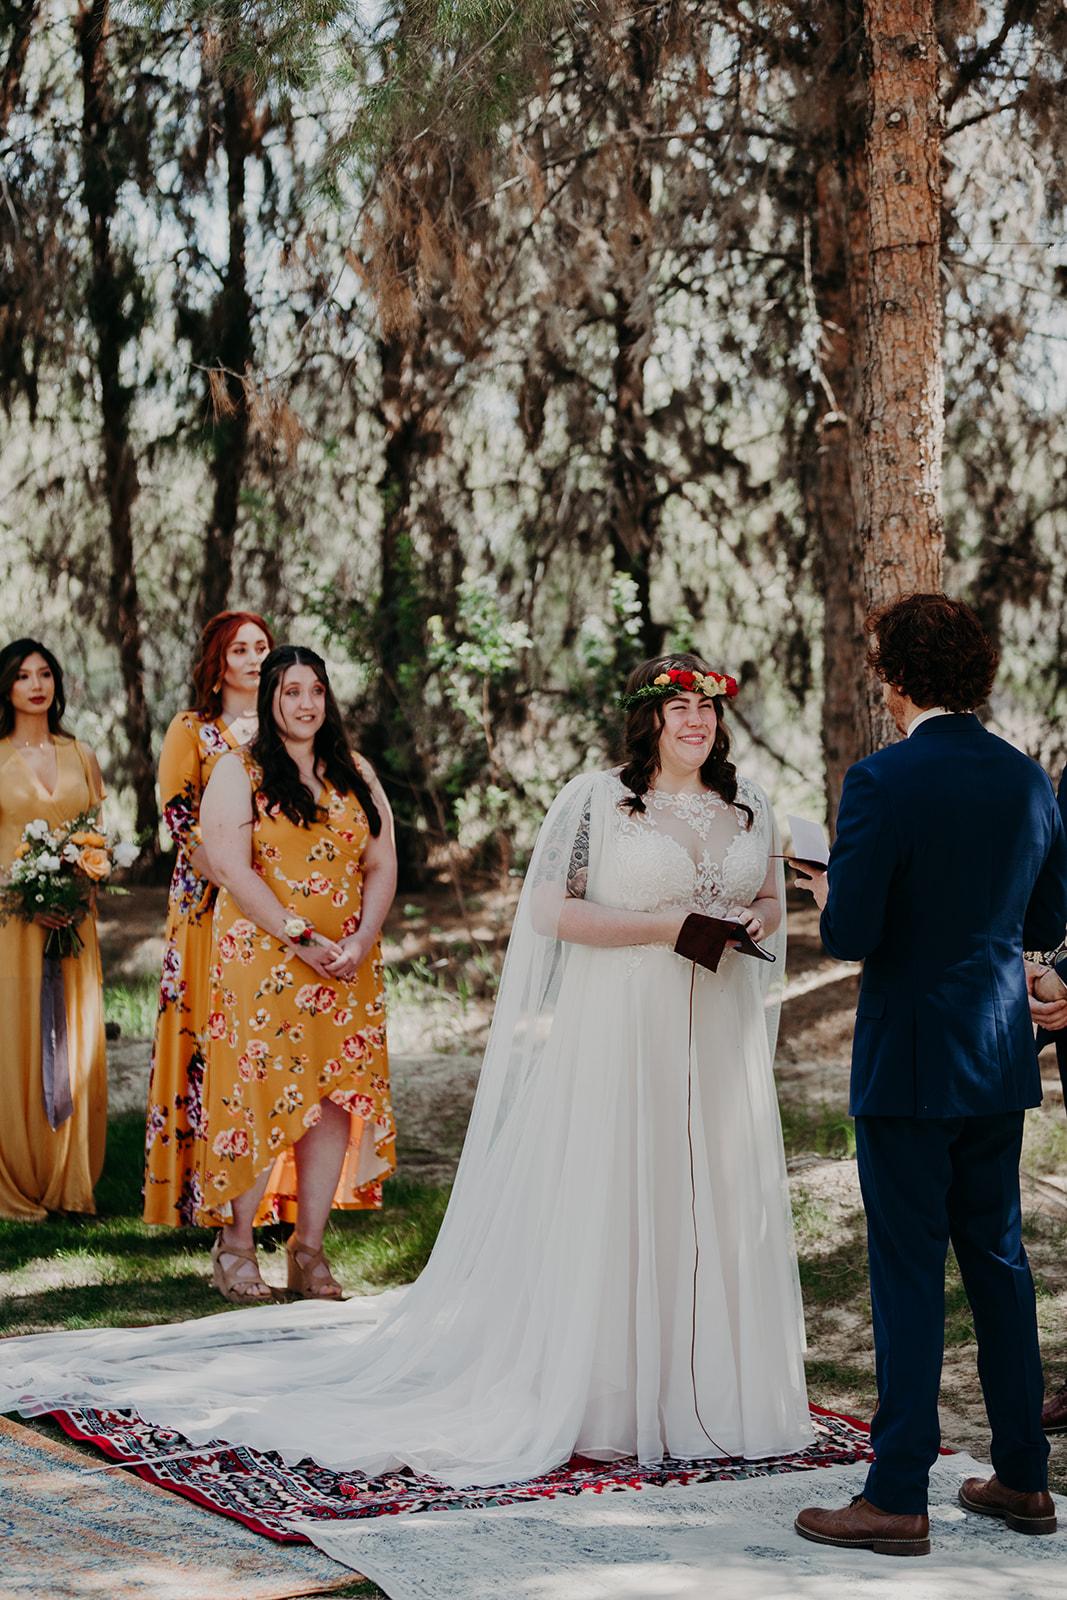 Disney Themed Wedding - Arizona florist Phoenix scottsdale Mesa chandler Sedona Flagstaff Prescott - Ceremony